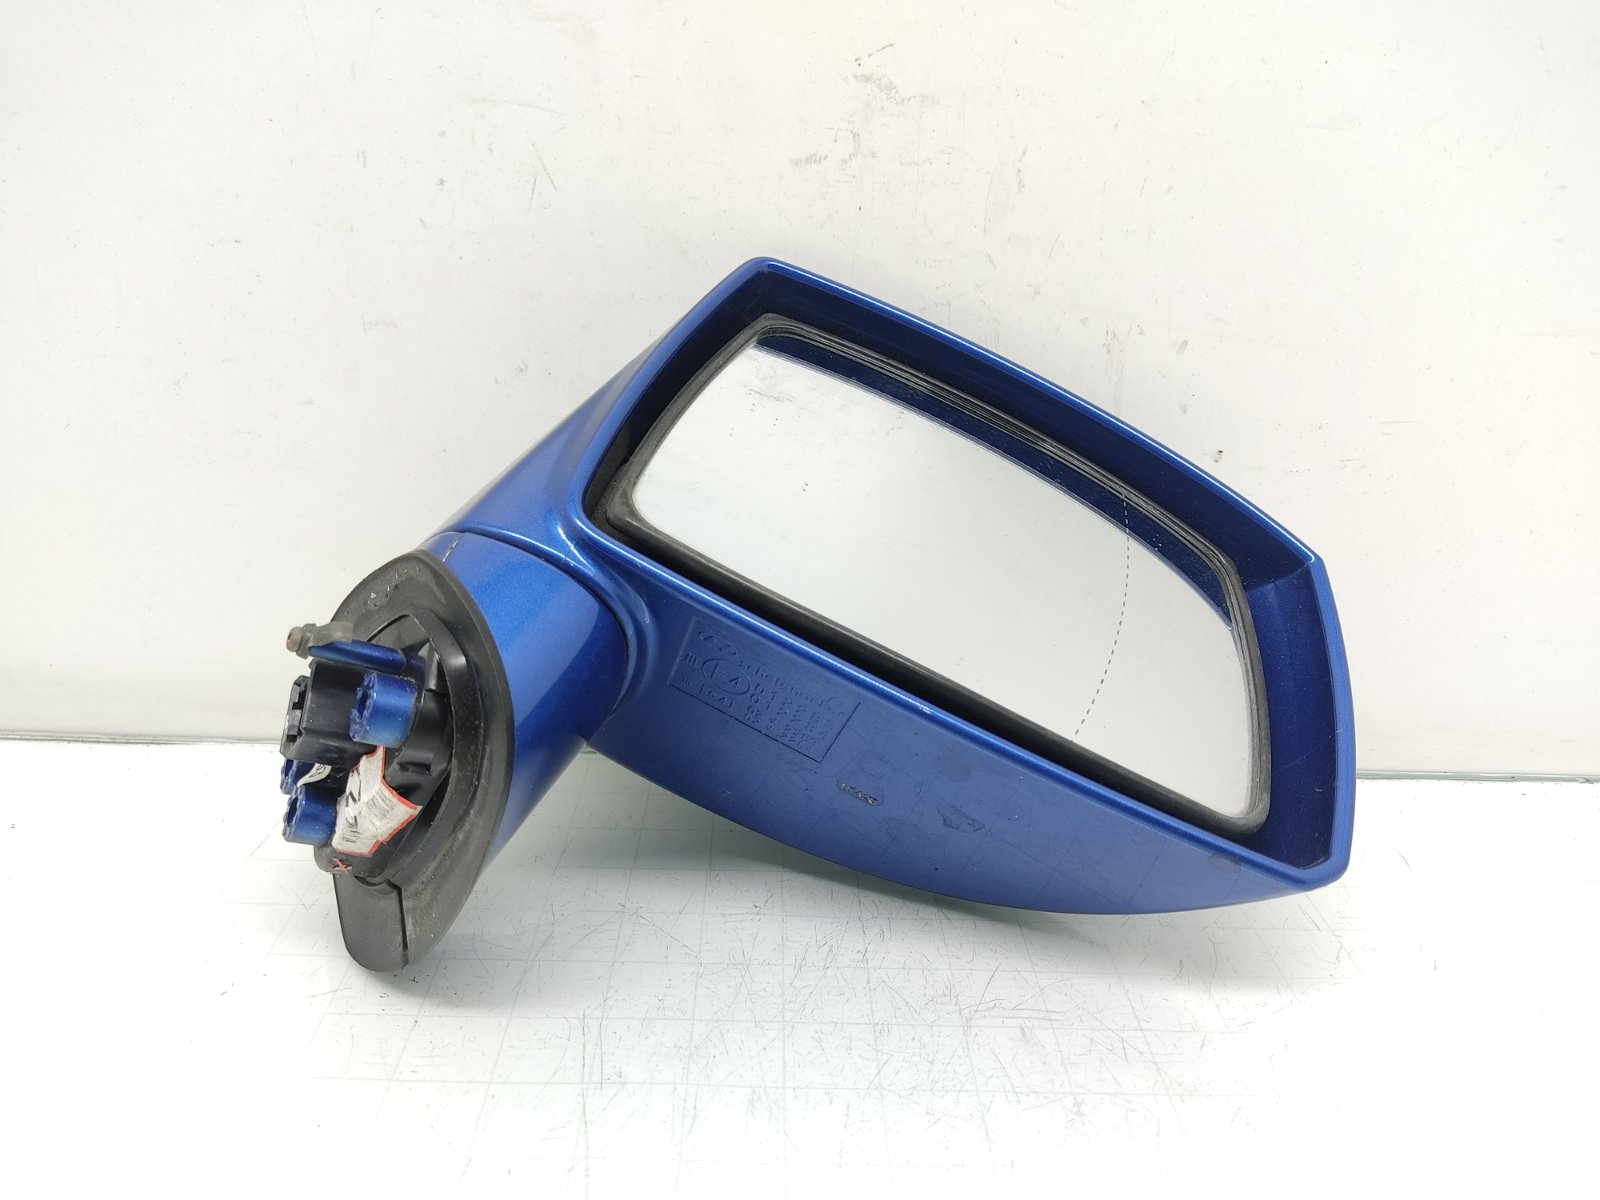 Зеркало наружное правое Hyundai Coupe 2.0 I 2005 (б/у)